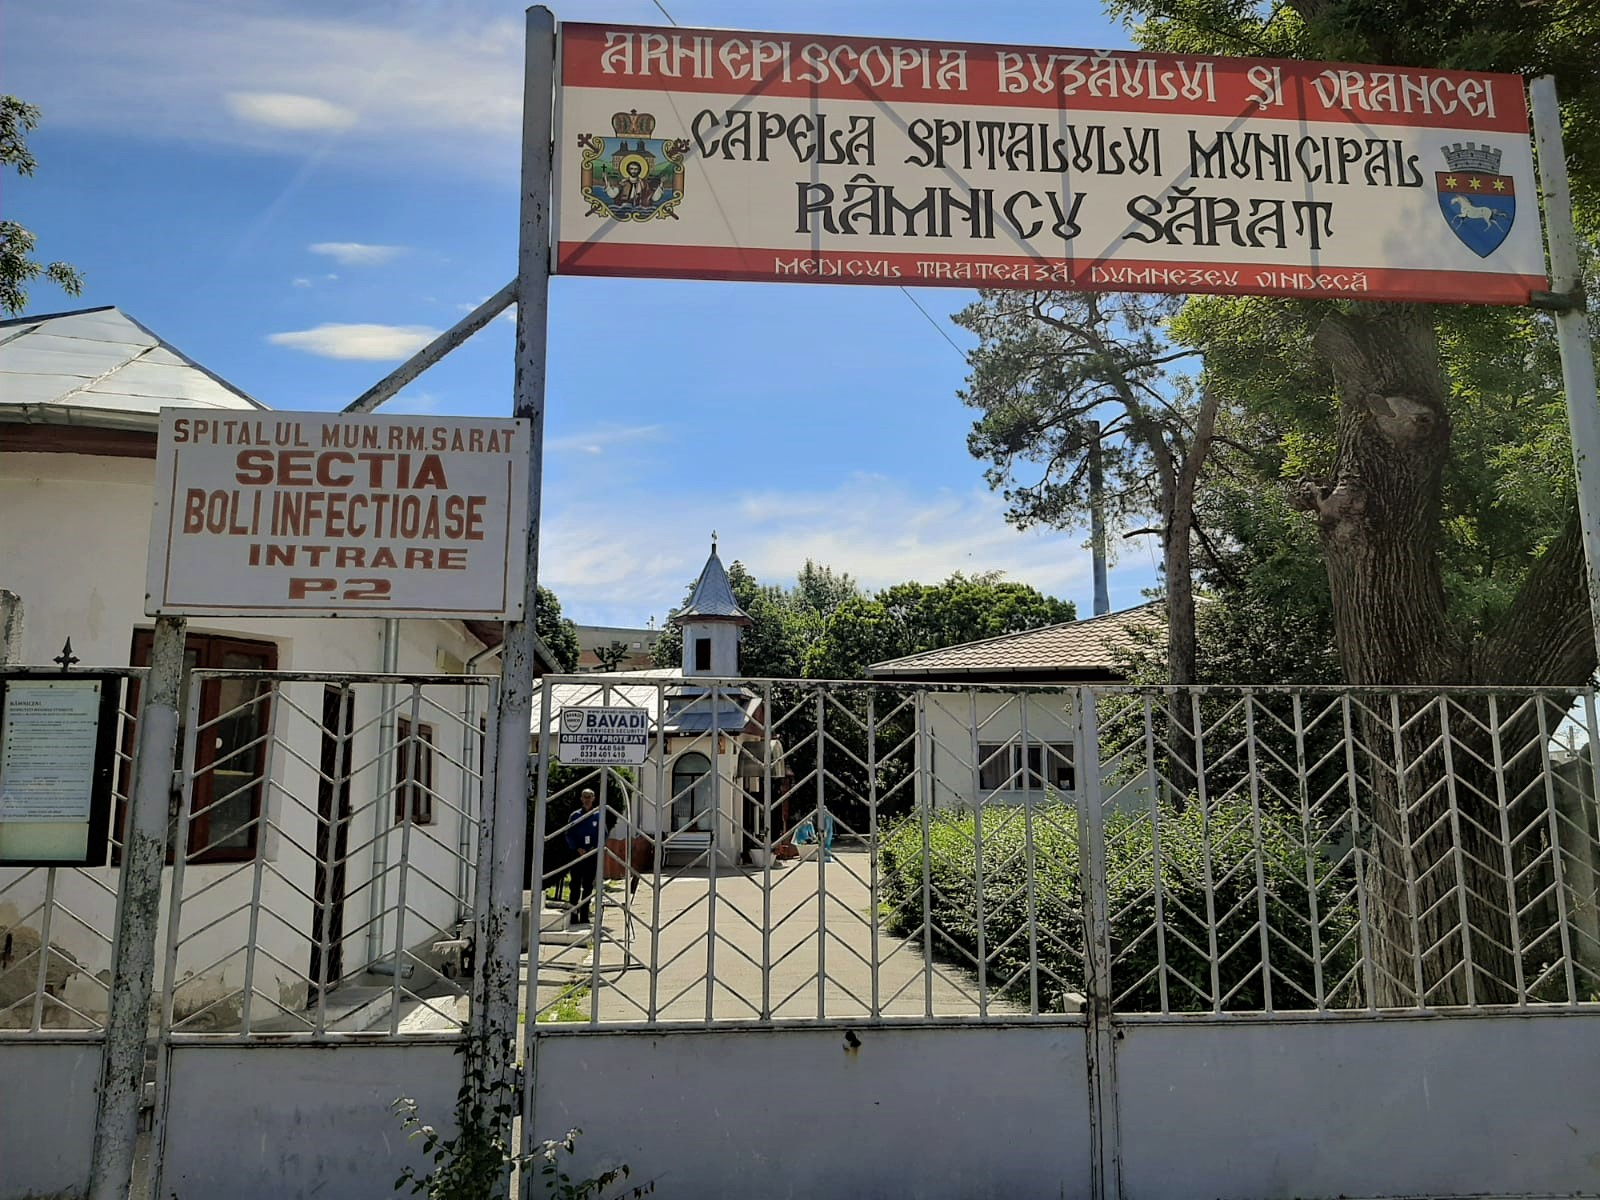 spitalul municipal rm. sarat